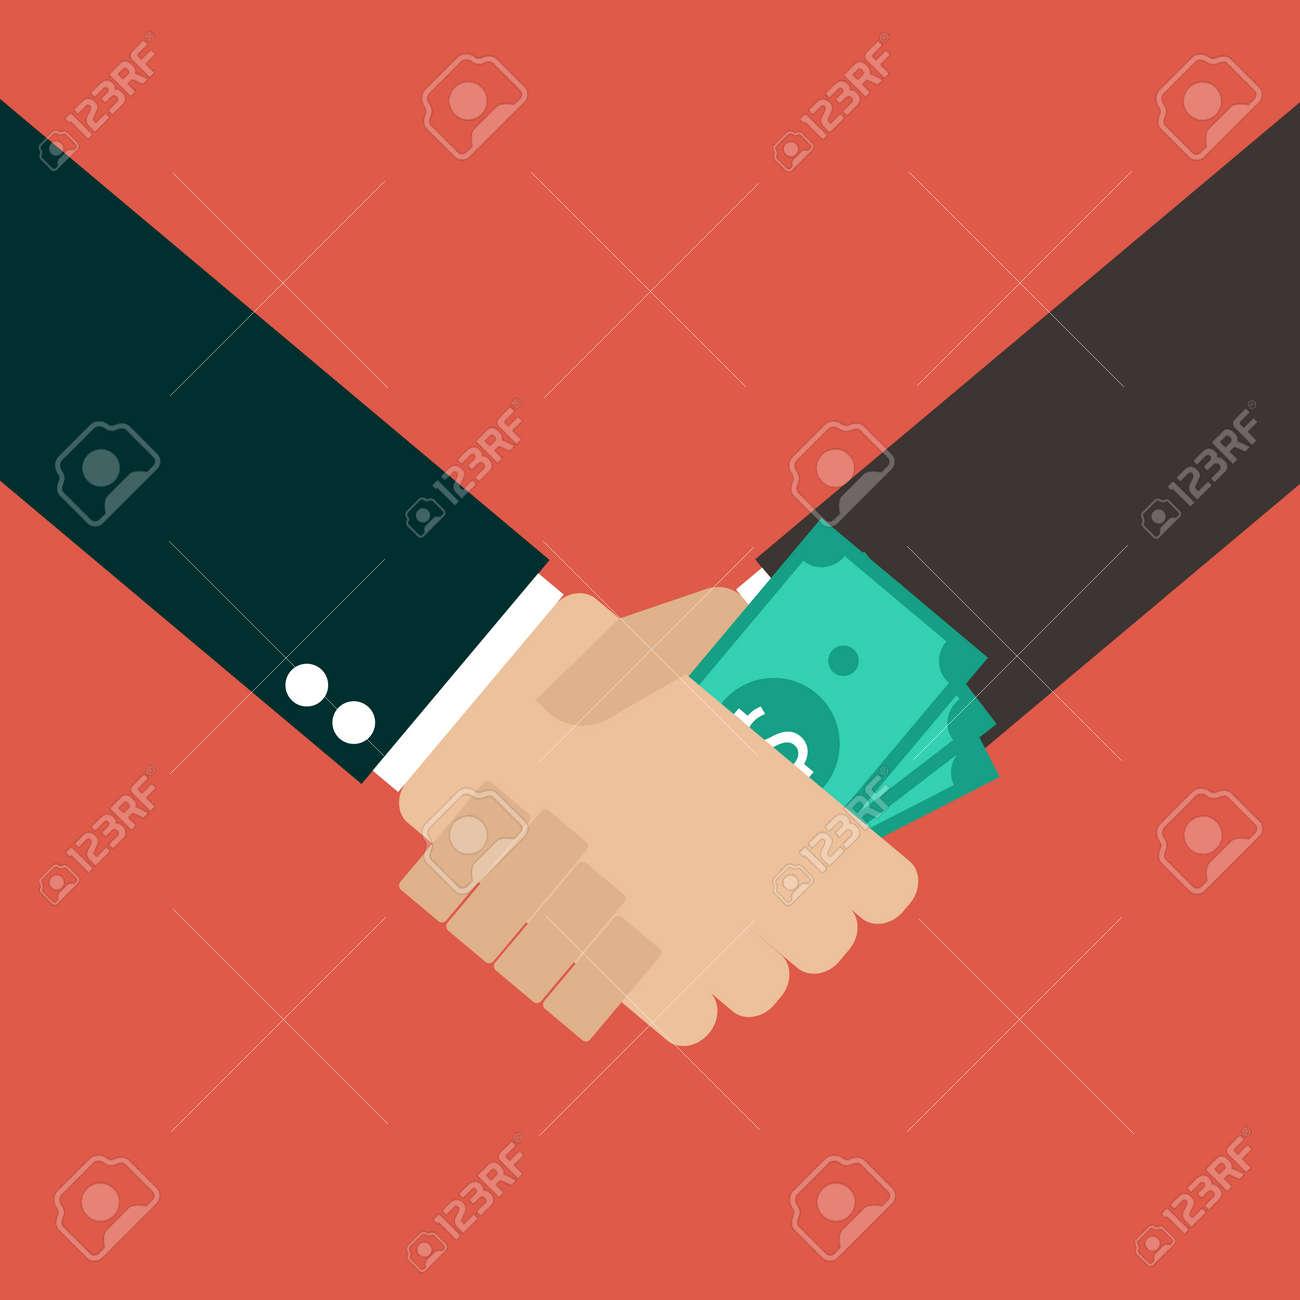 Business Corruption Handshake - 45244802